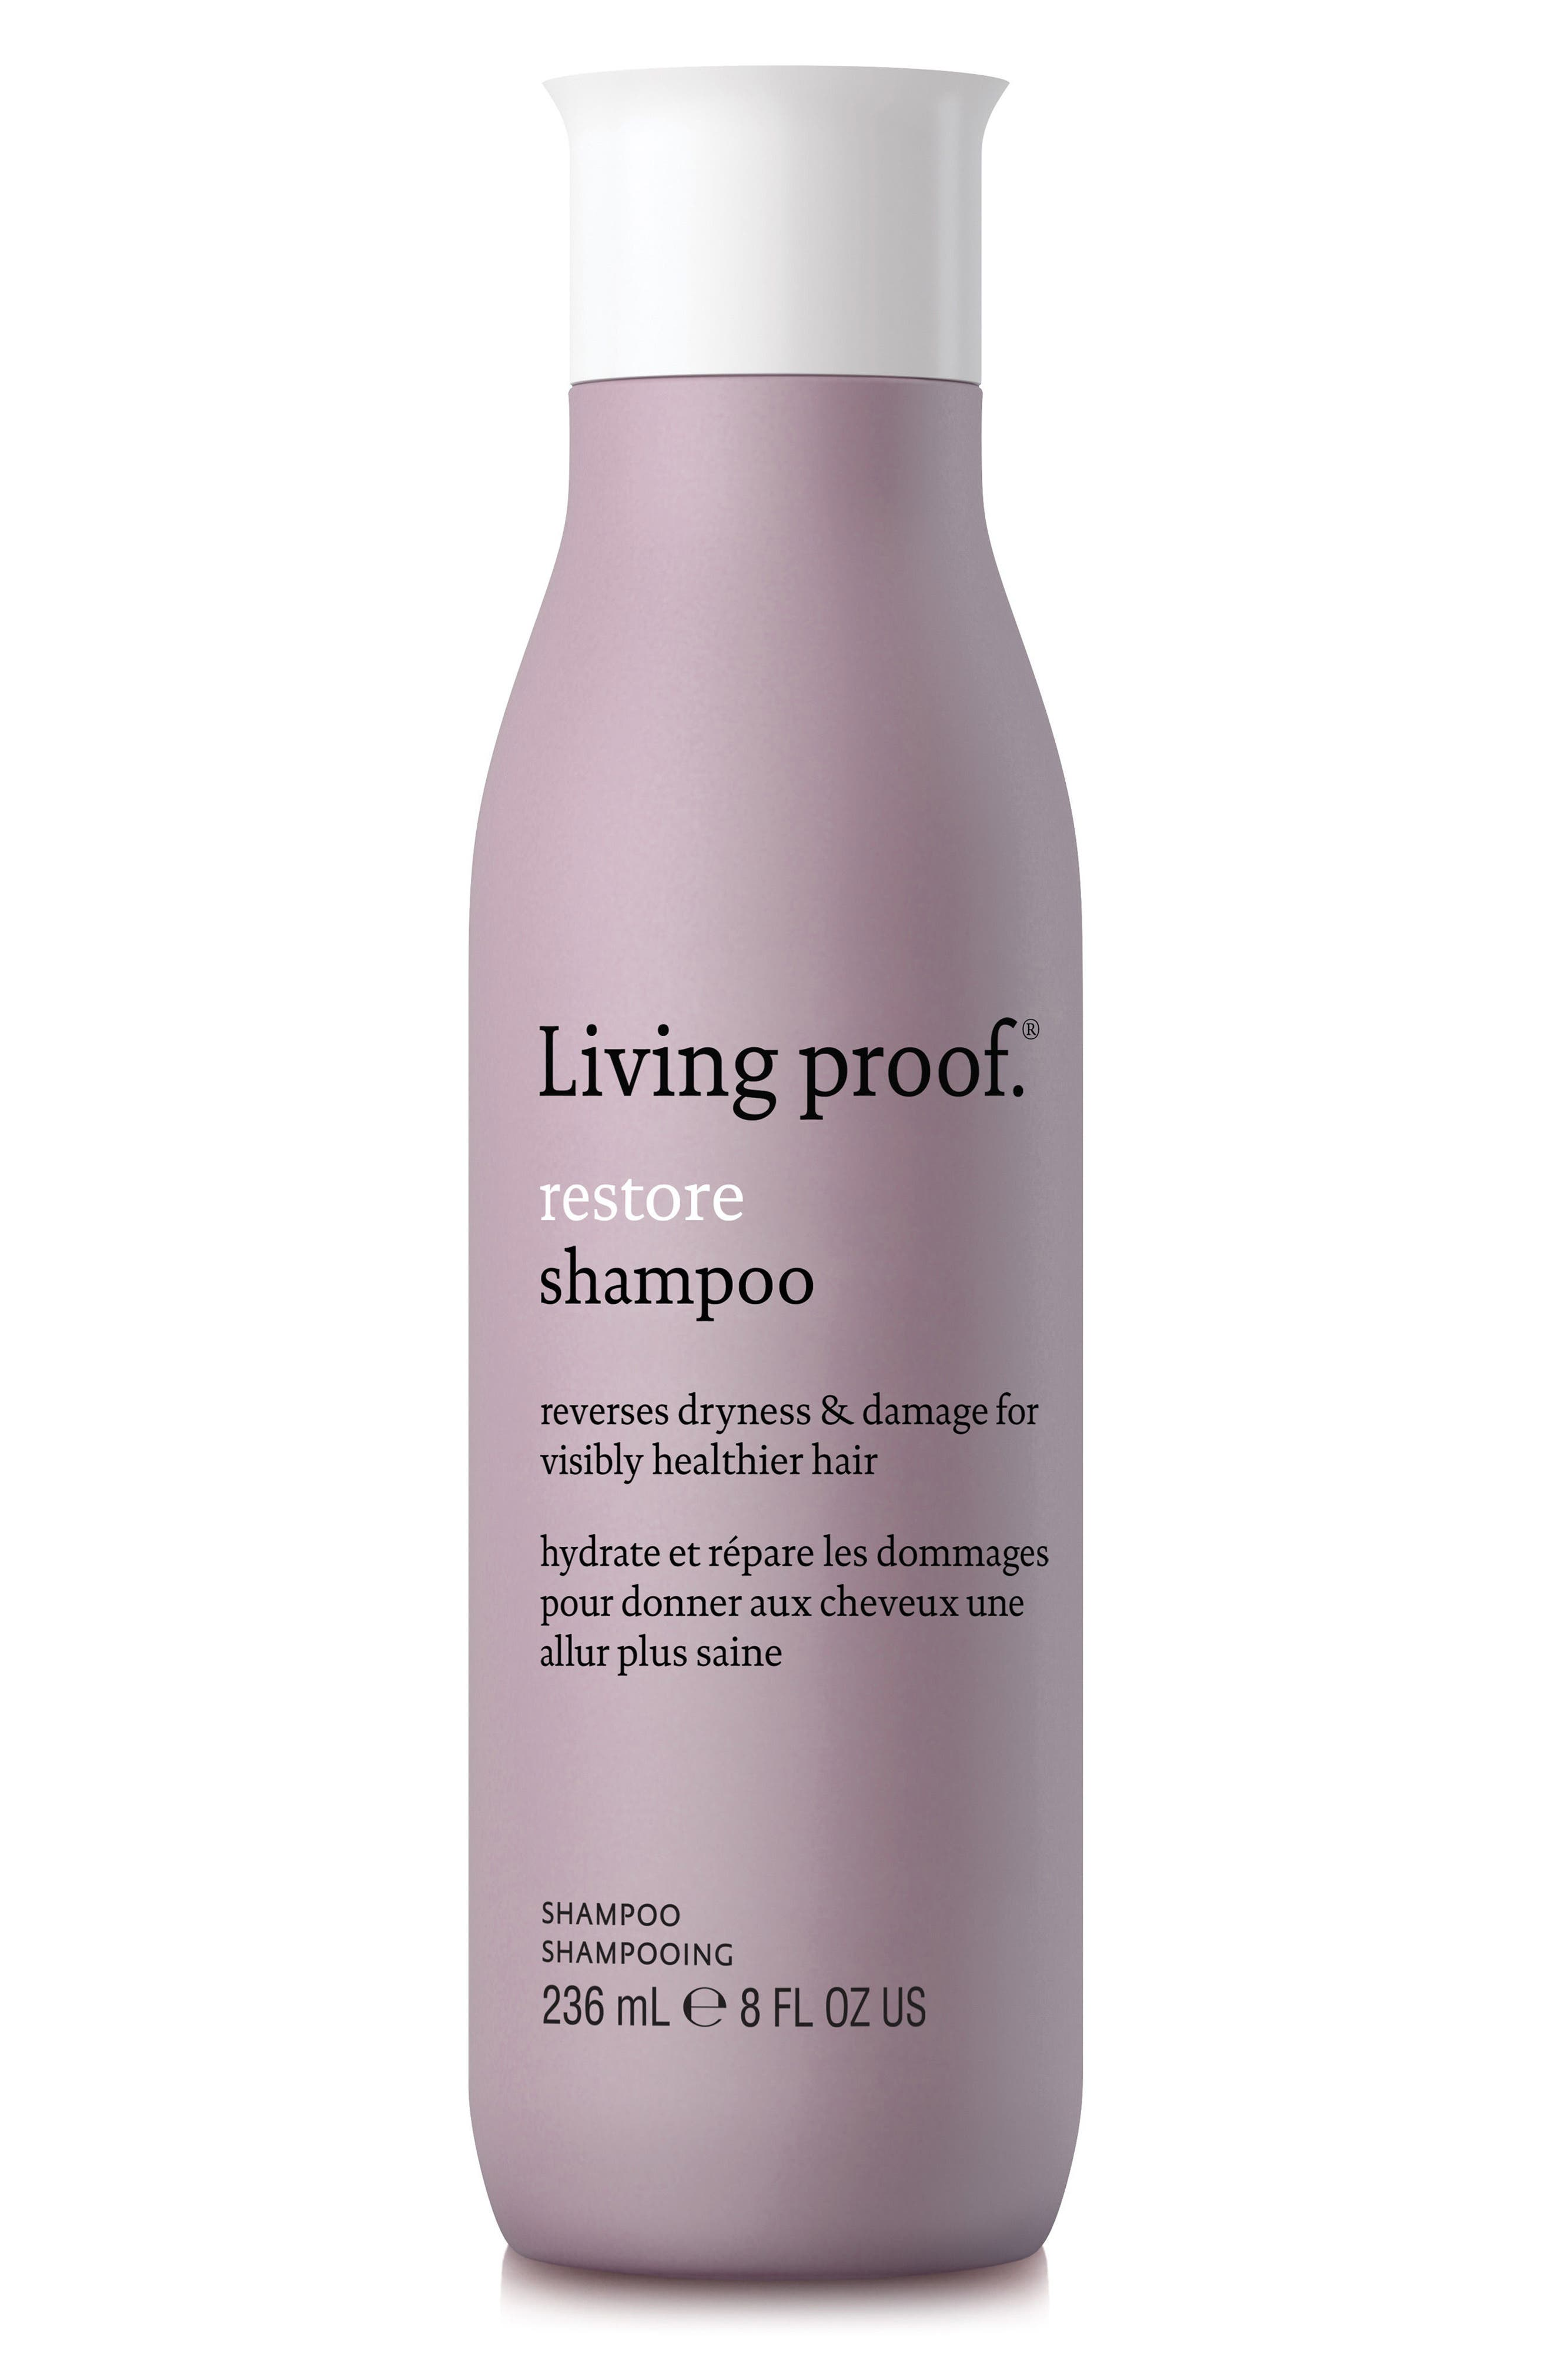 Living proof® Restore Shampoo